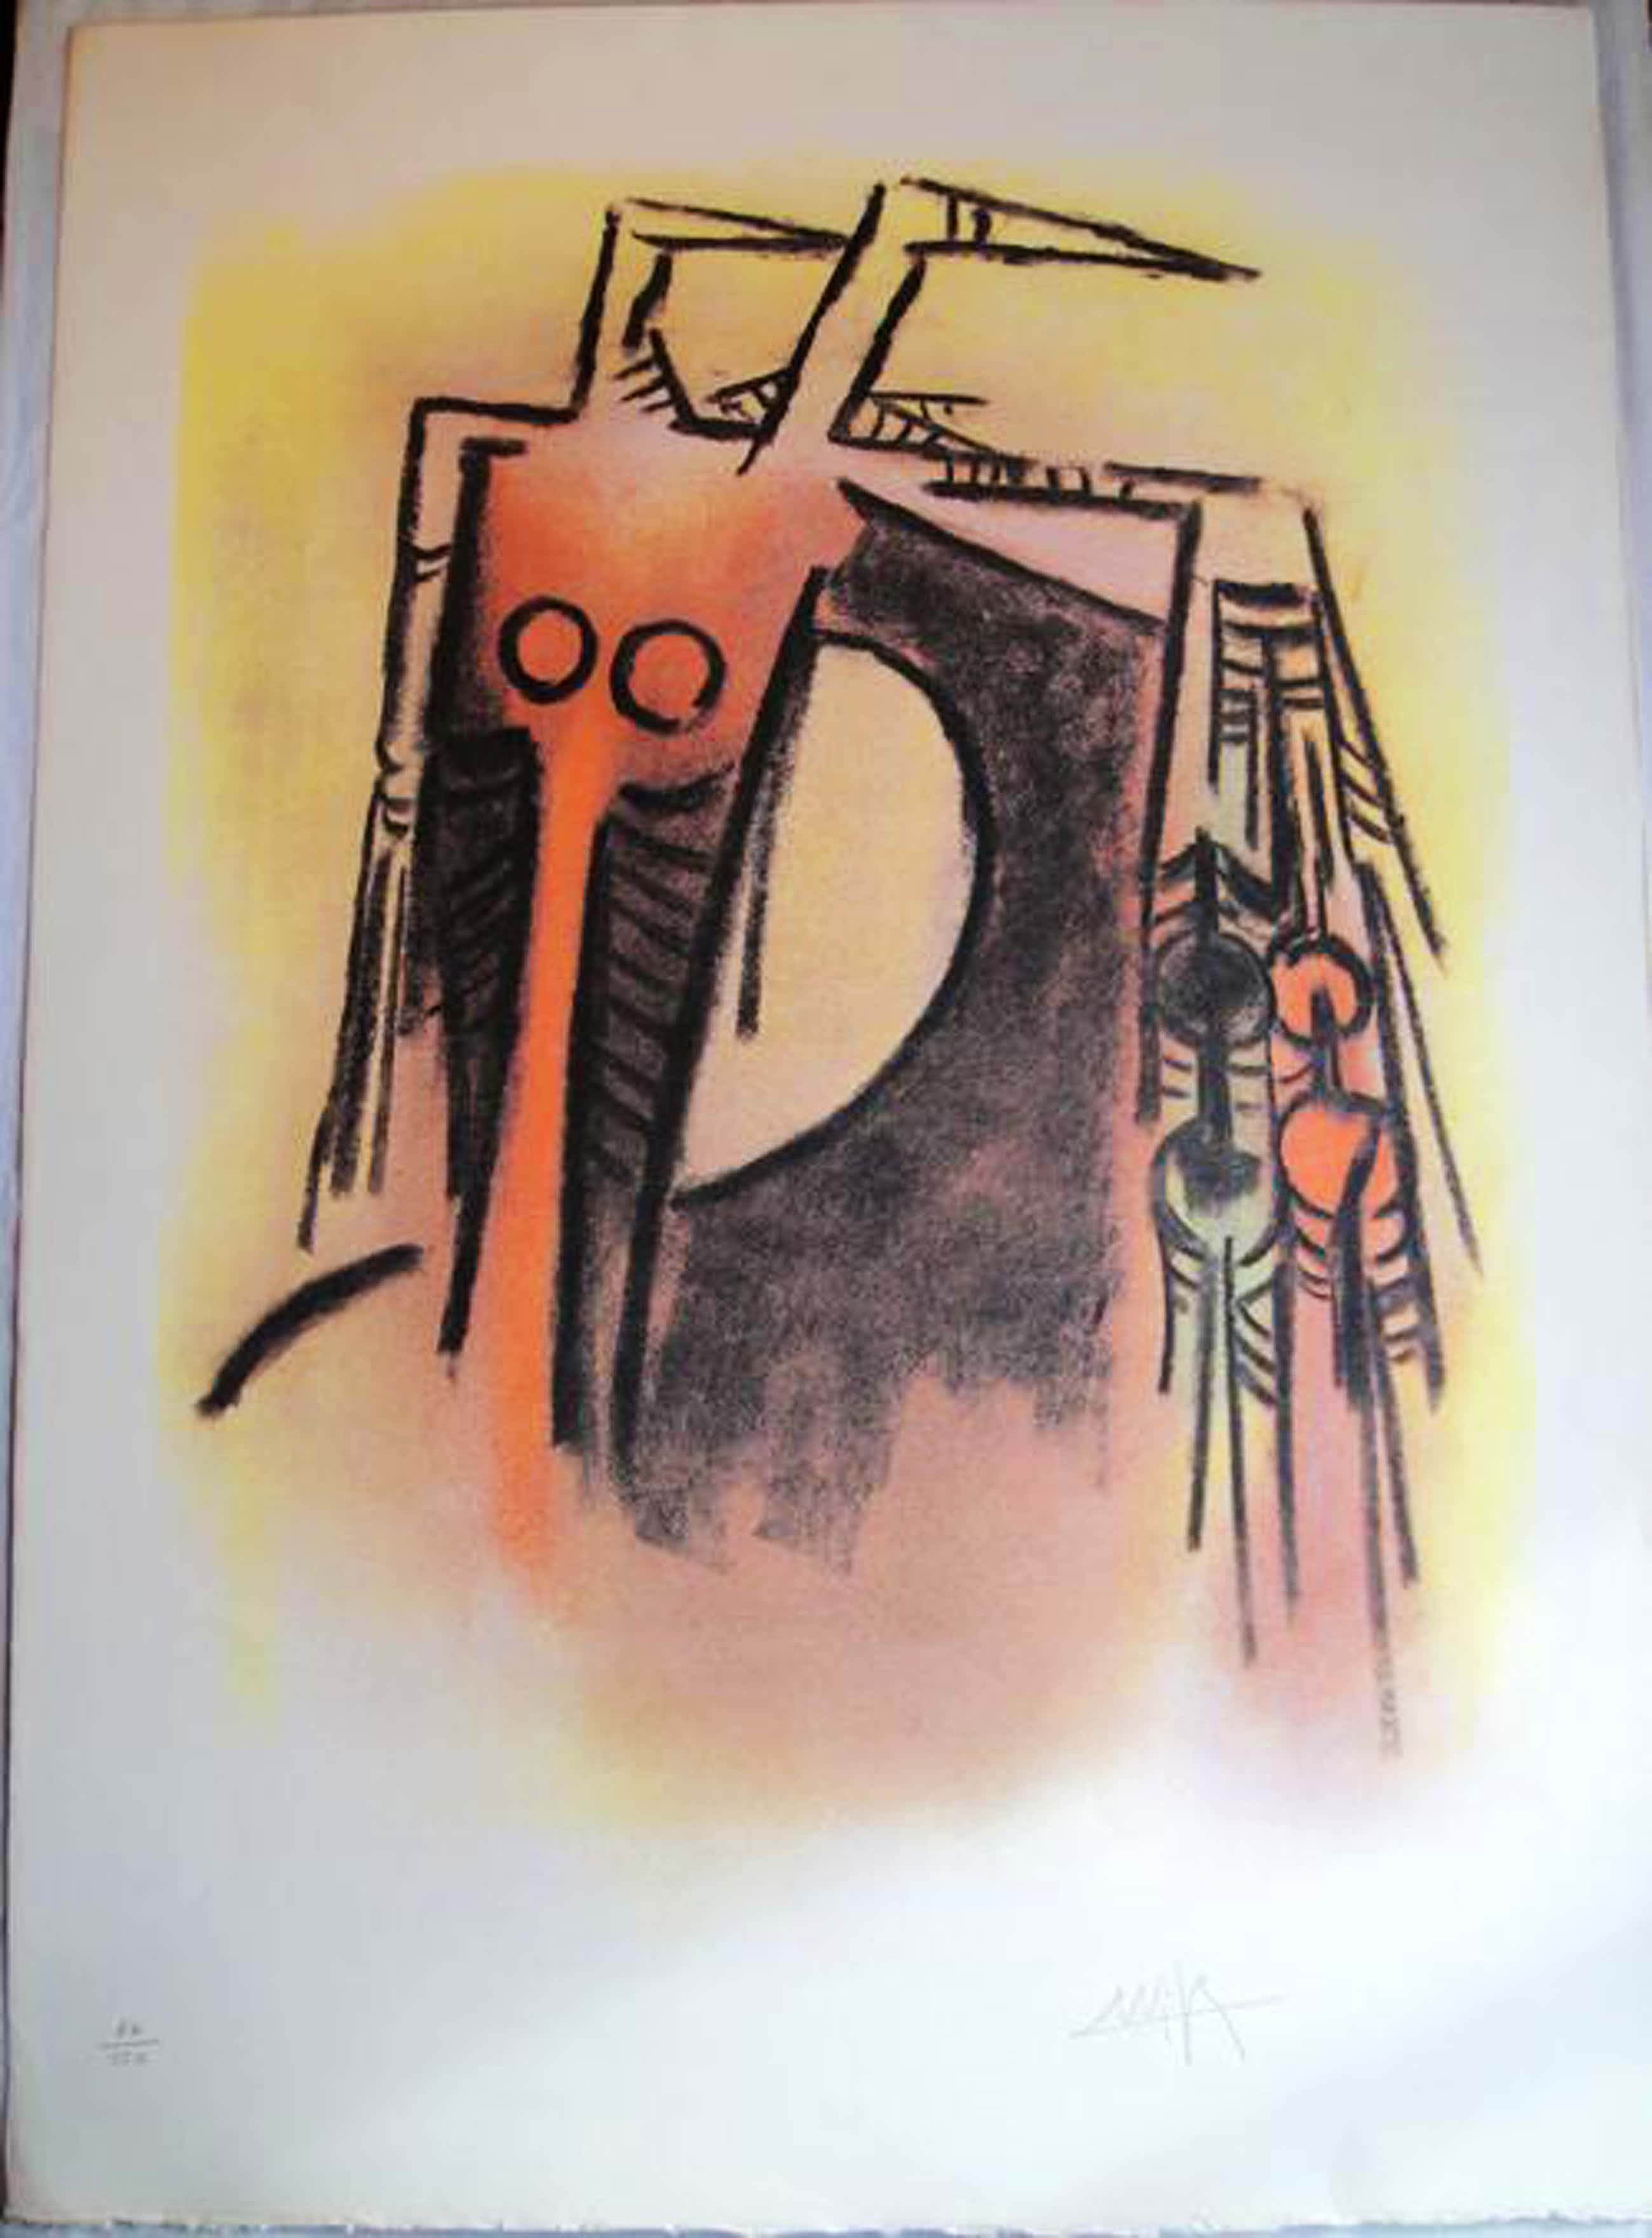 Wifredo Lam - Originale handsignierte Farblithografie - Sehr grosses Blatt kopen? Bied vanaf 490!